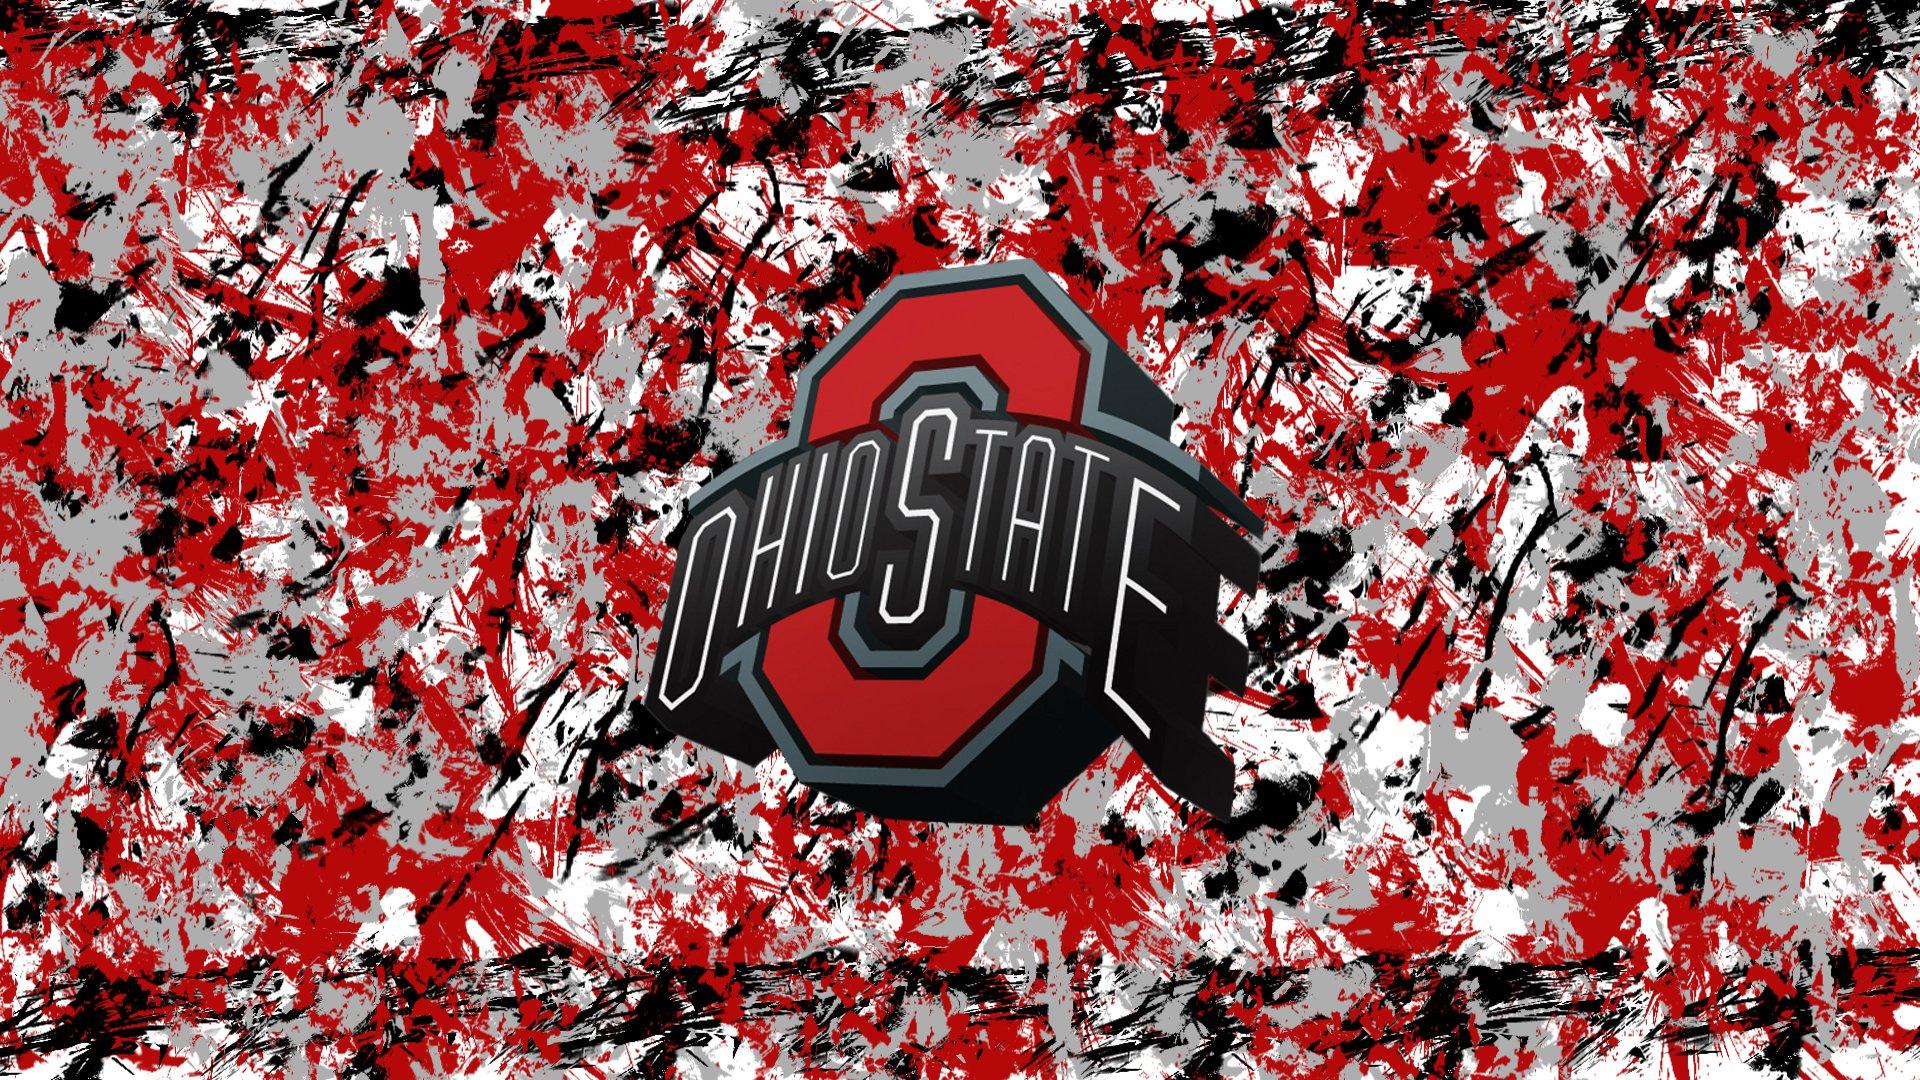 OHIO STATE BUCKEYES college football